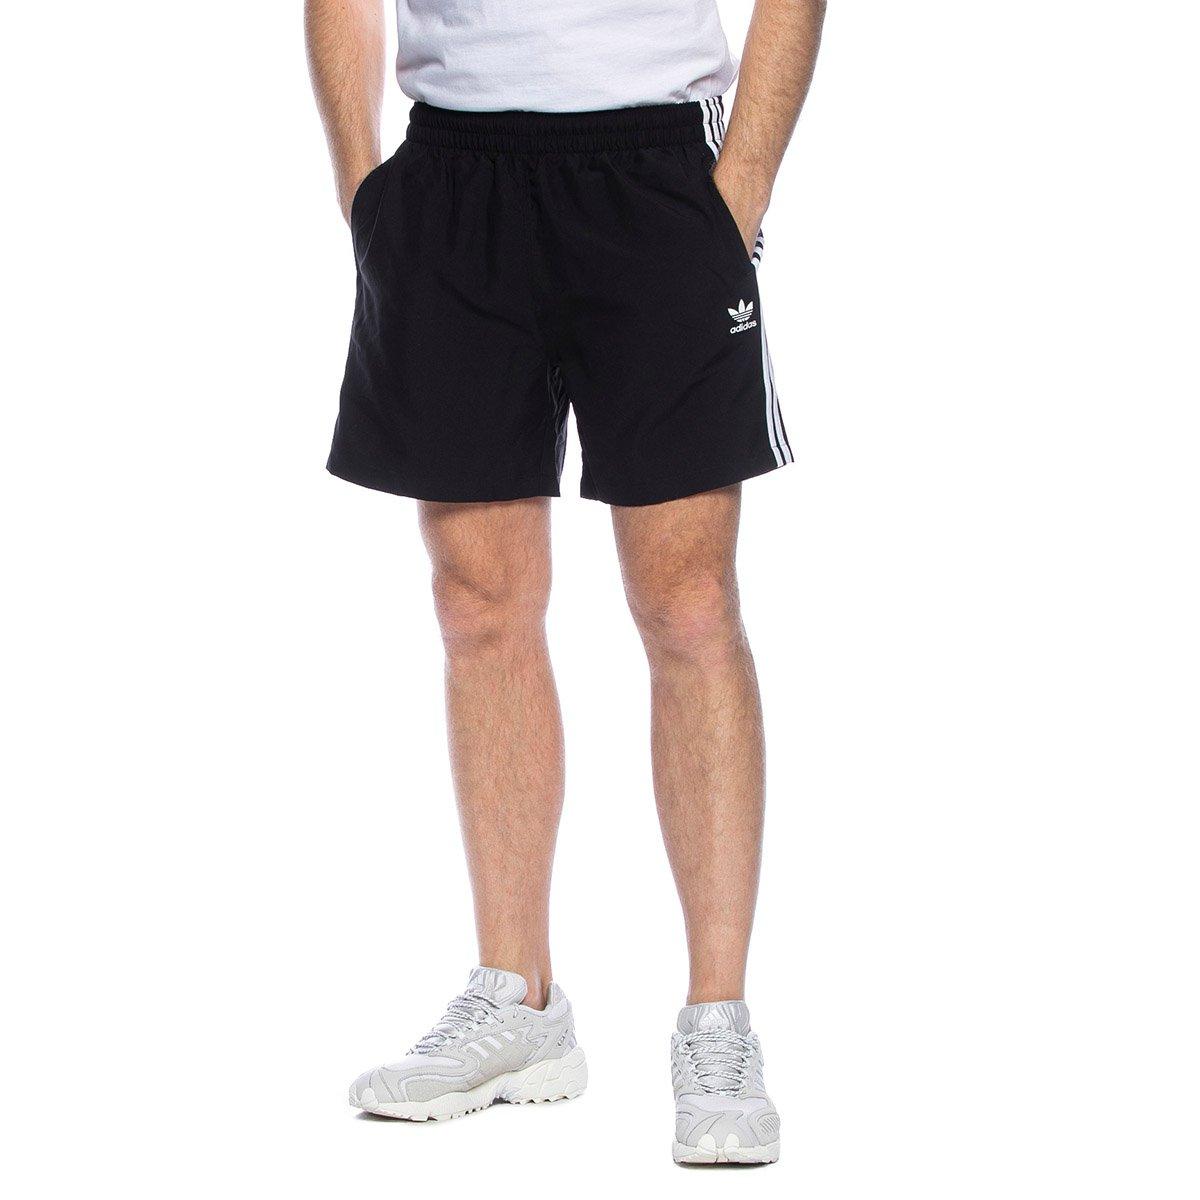 Szorty Adidas Originals 3 Stripes Swim Shorts czarne